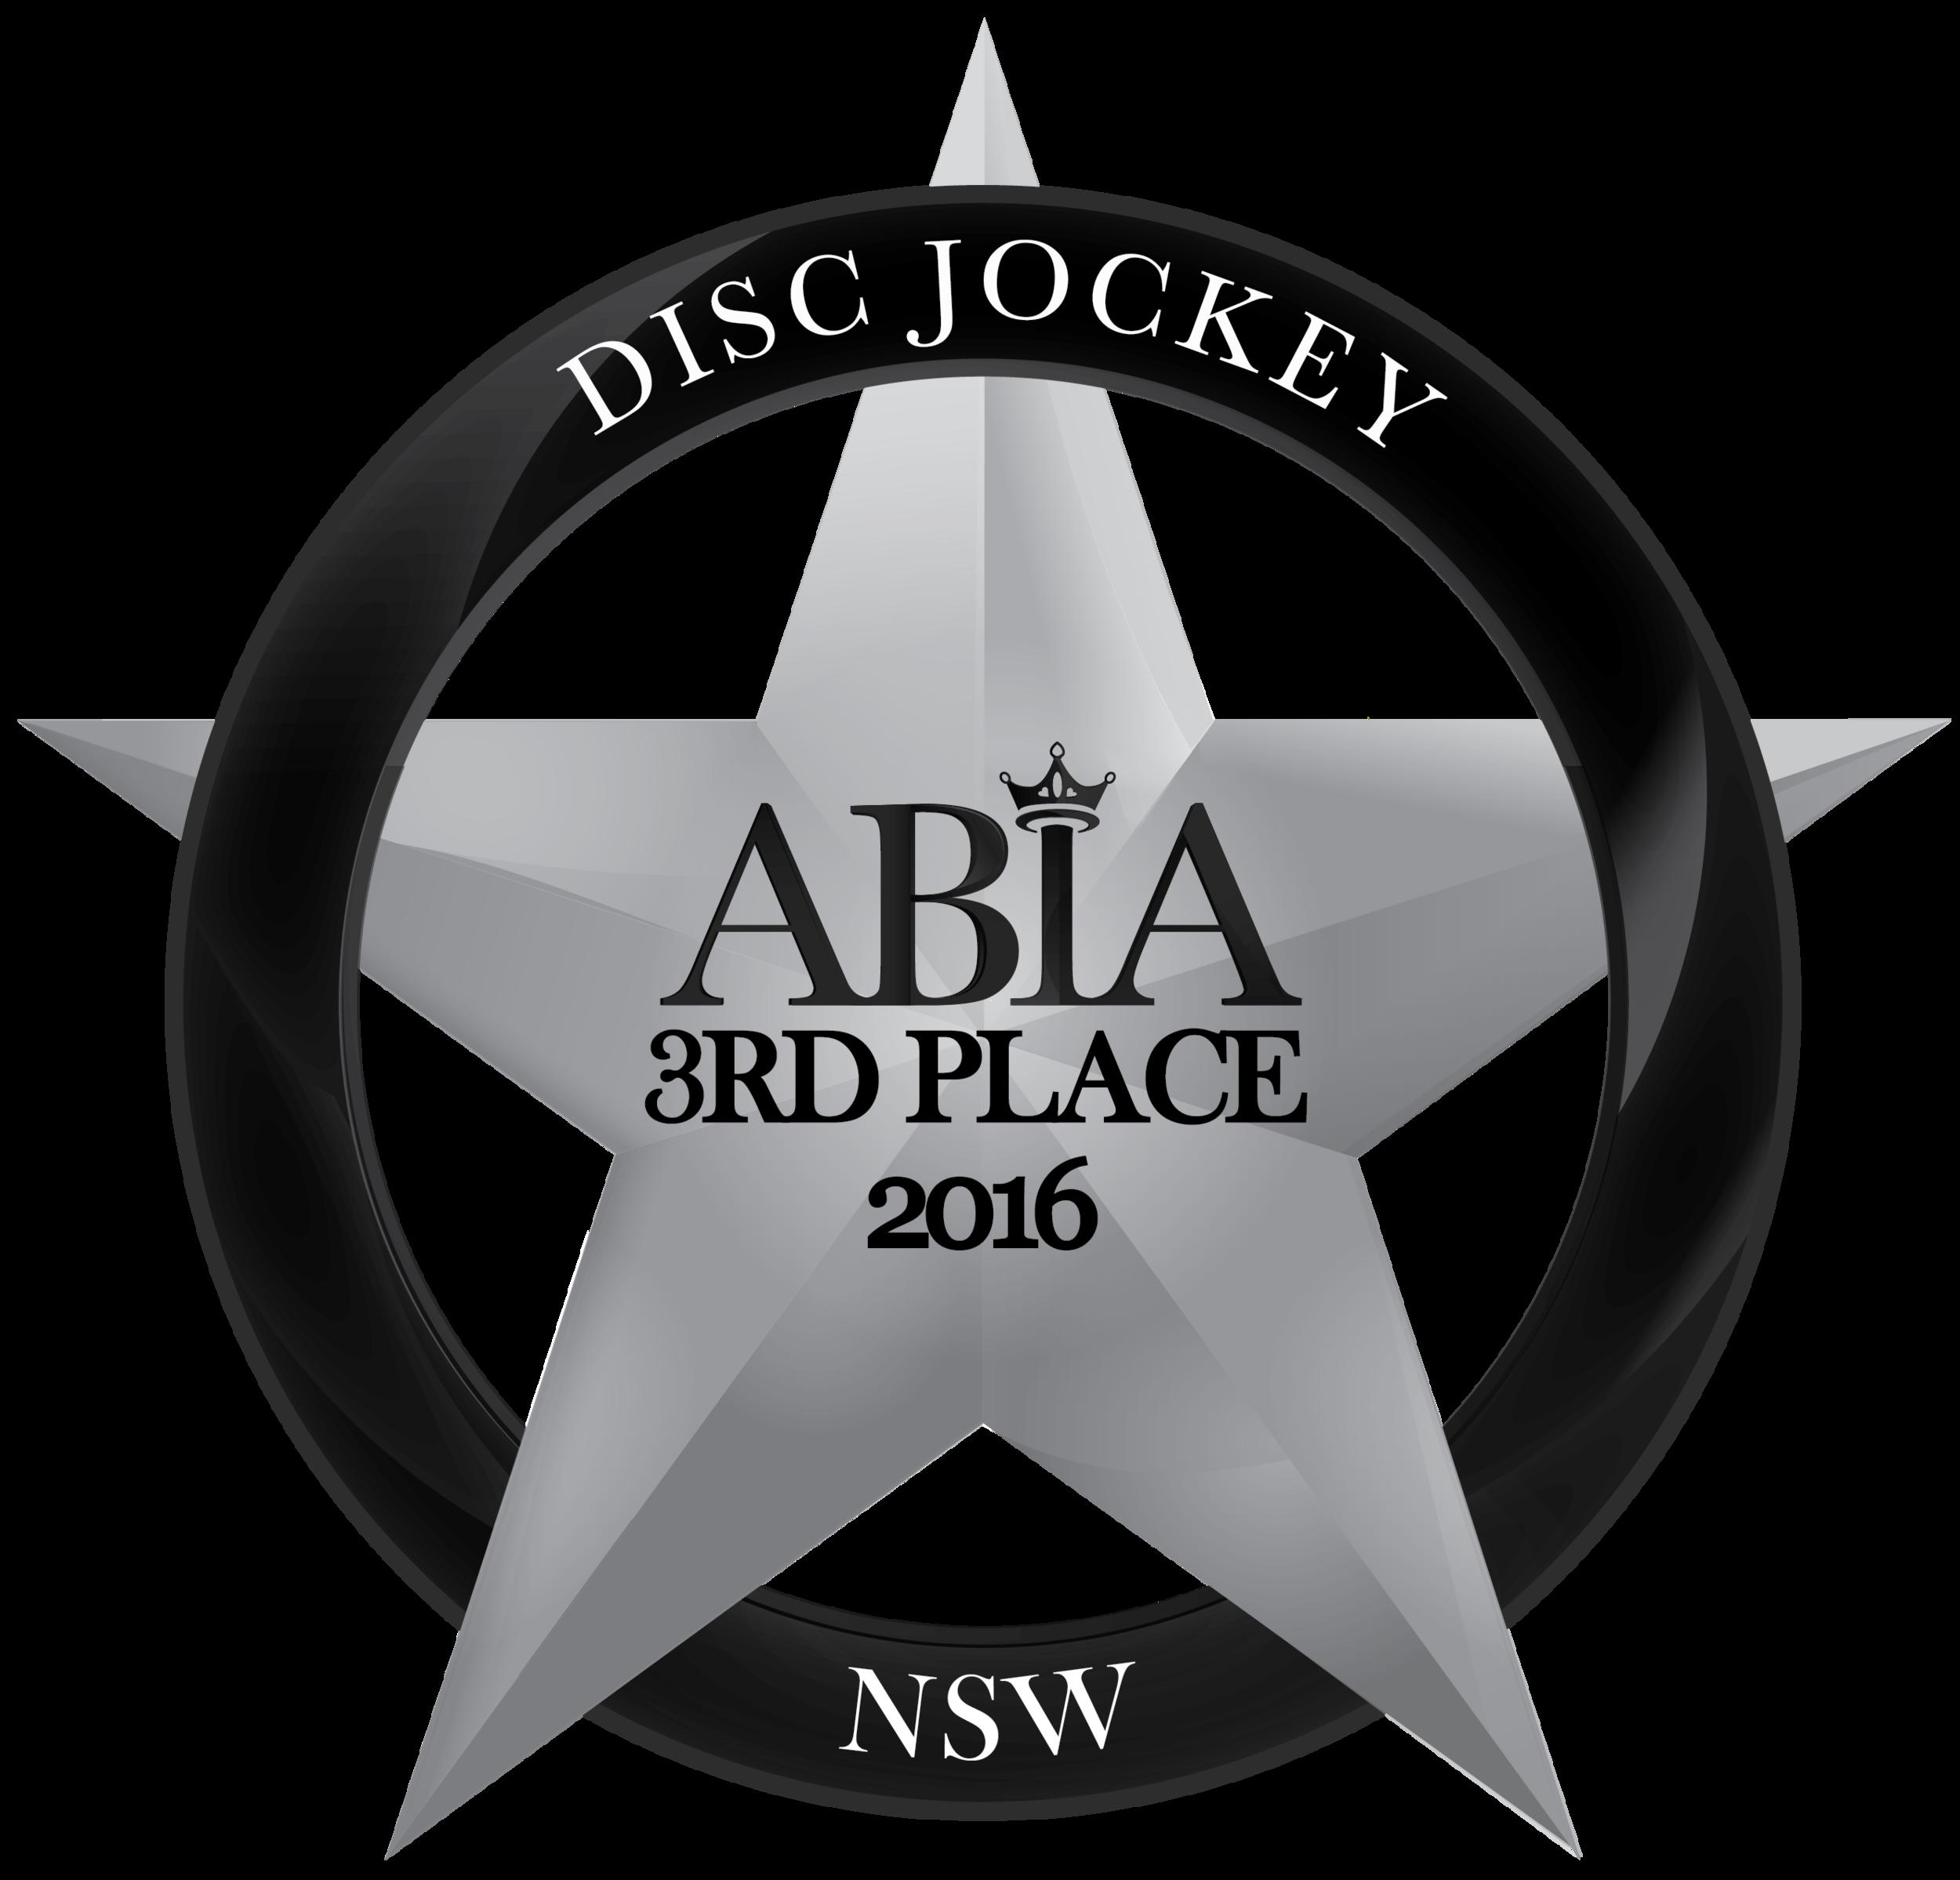 DiscJockey-ABIA-Award-2016_3RD PLACE.png